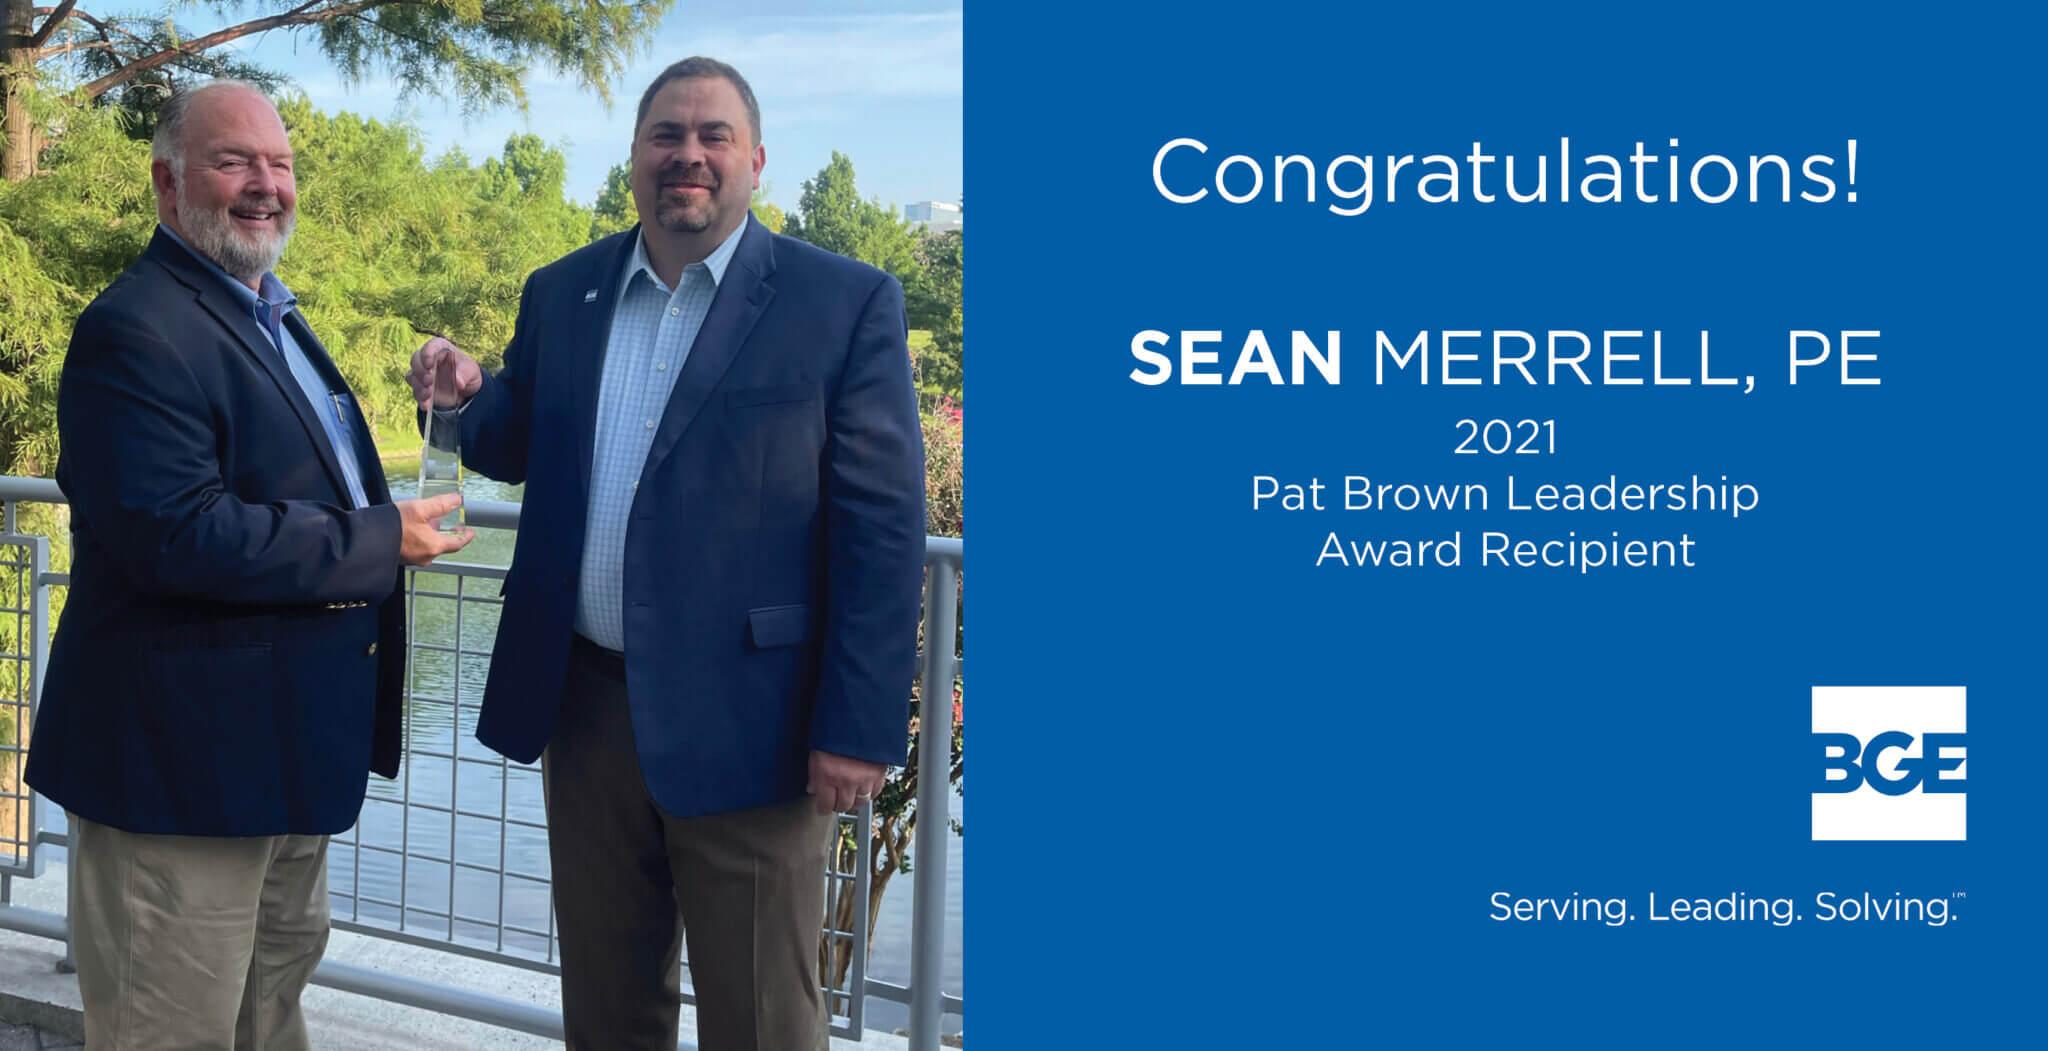 Merrell Honored with 2021 Pat Brown Leadership Award